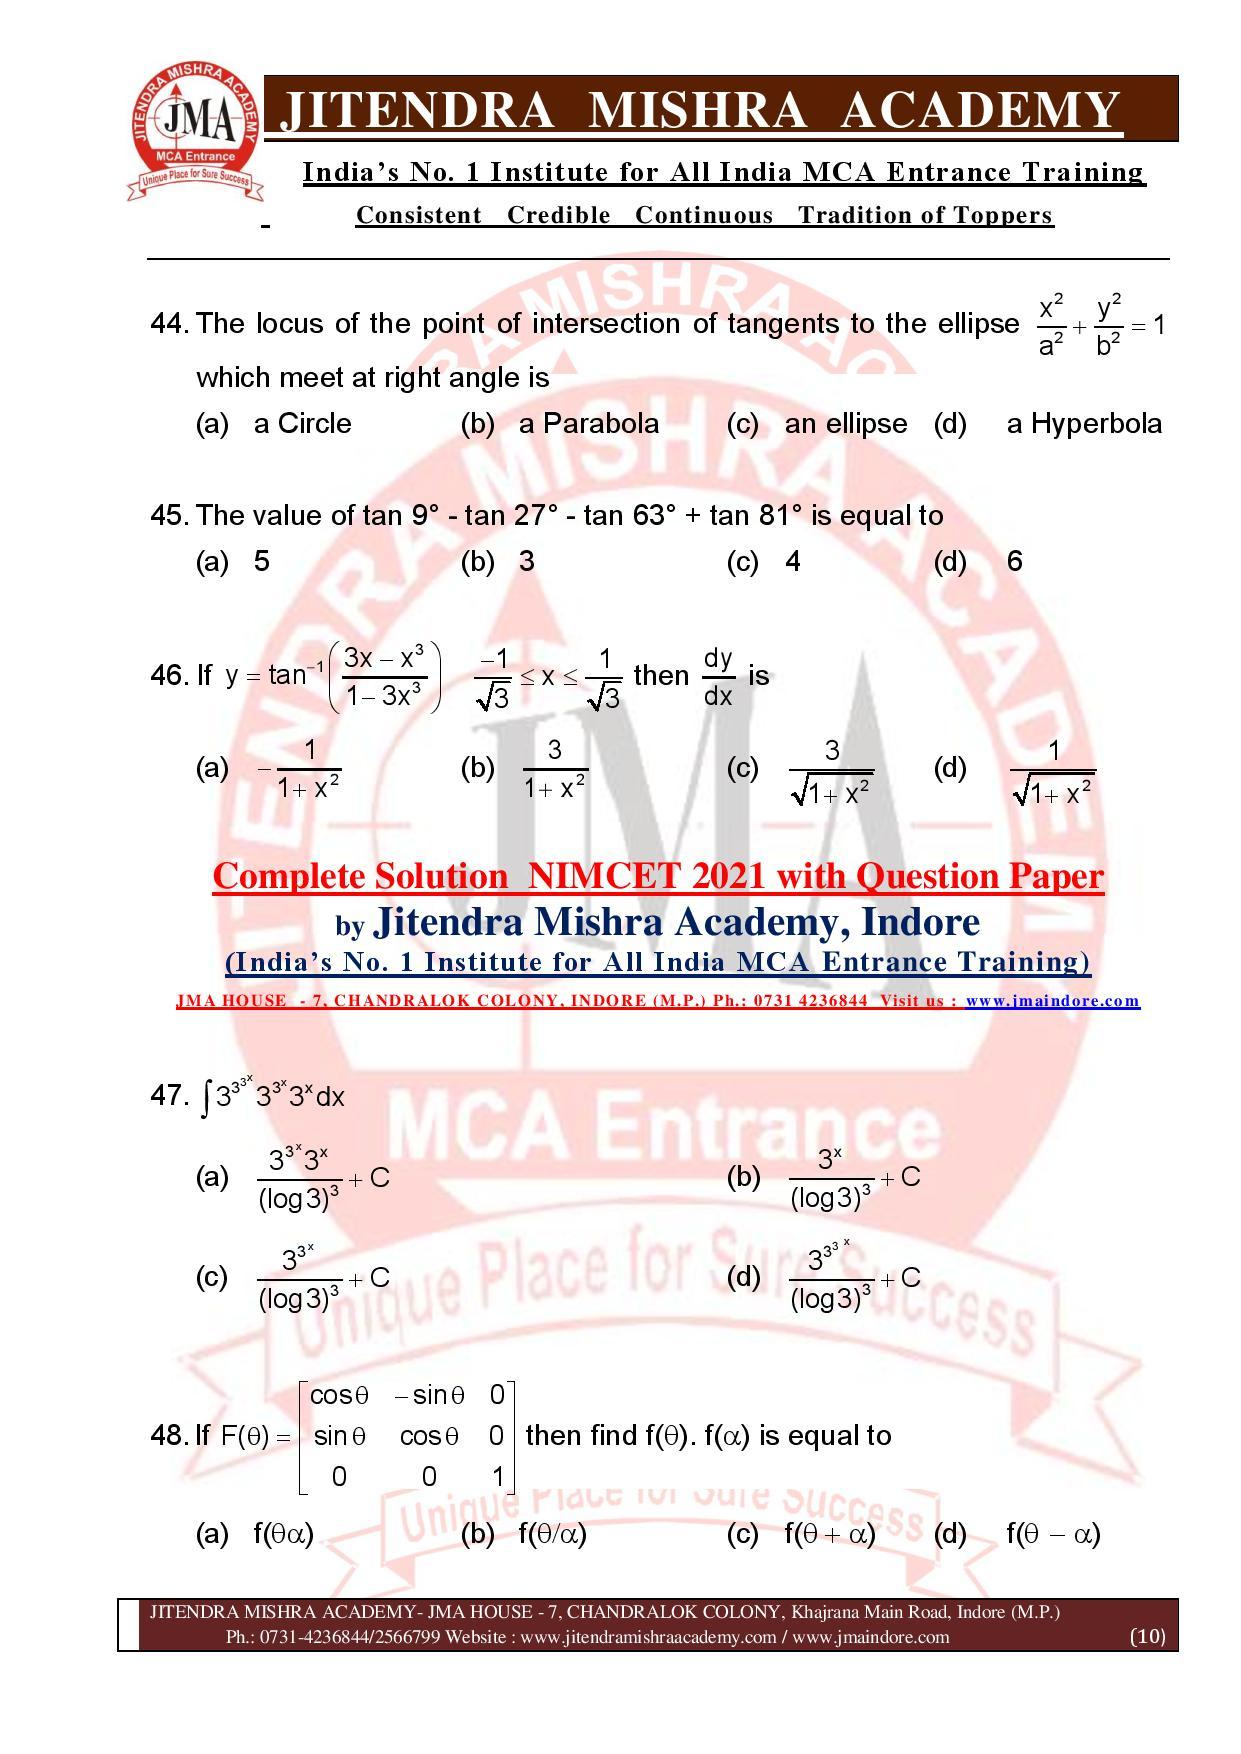 NIMCET 2021 QUESTION PAPER (F)-page-010